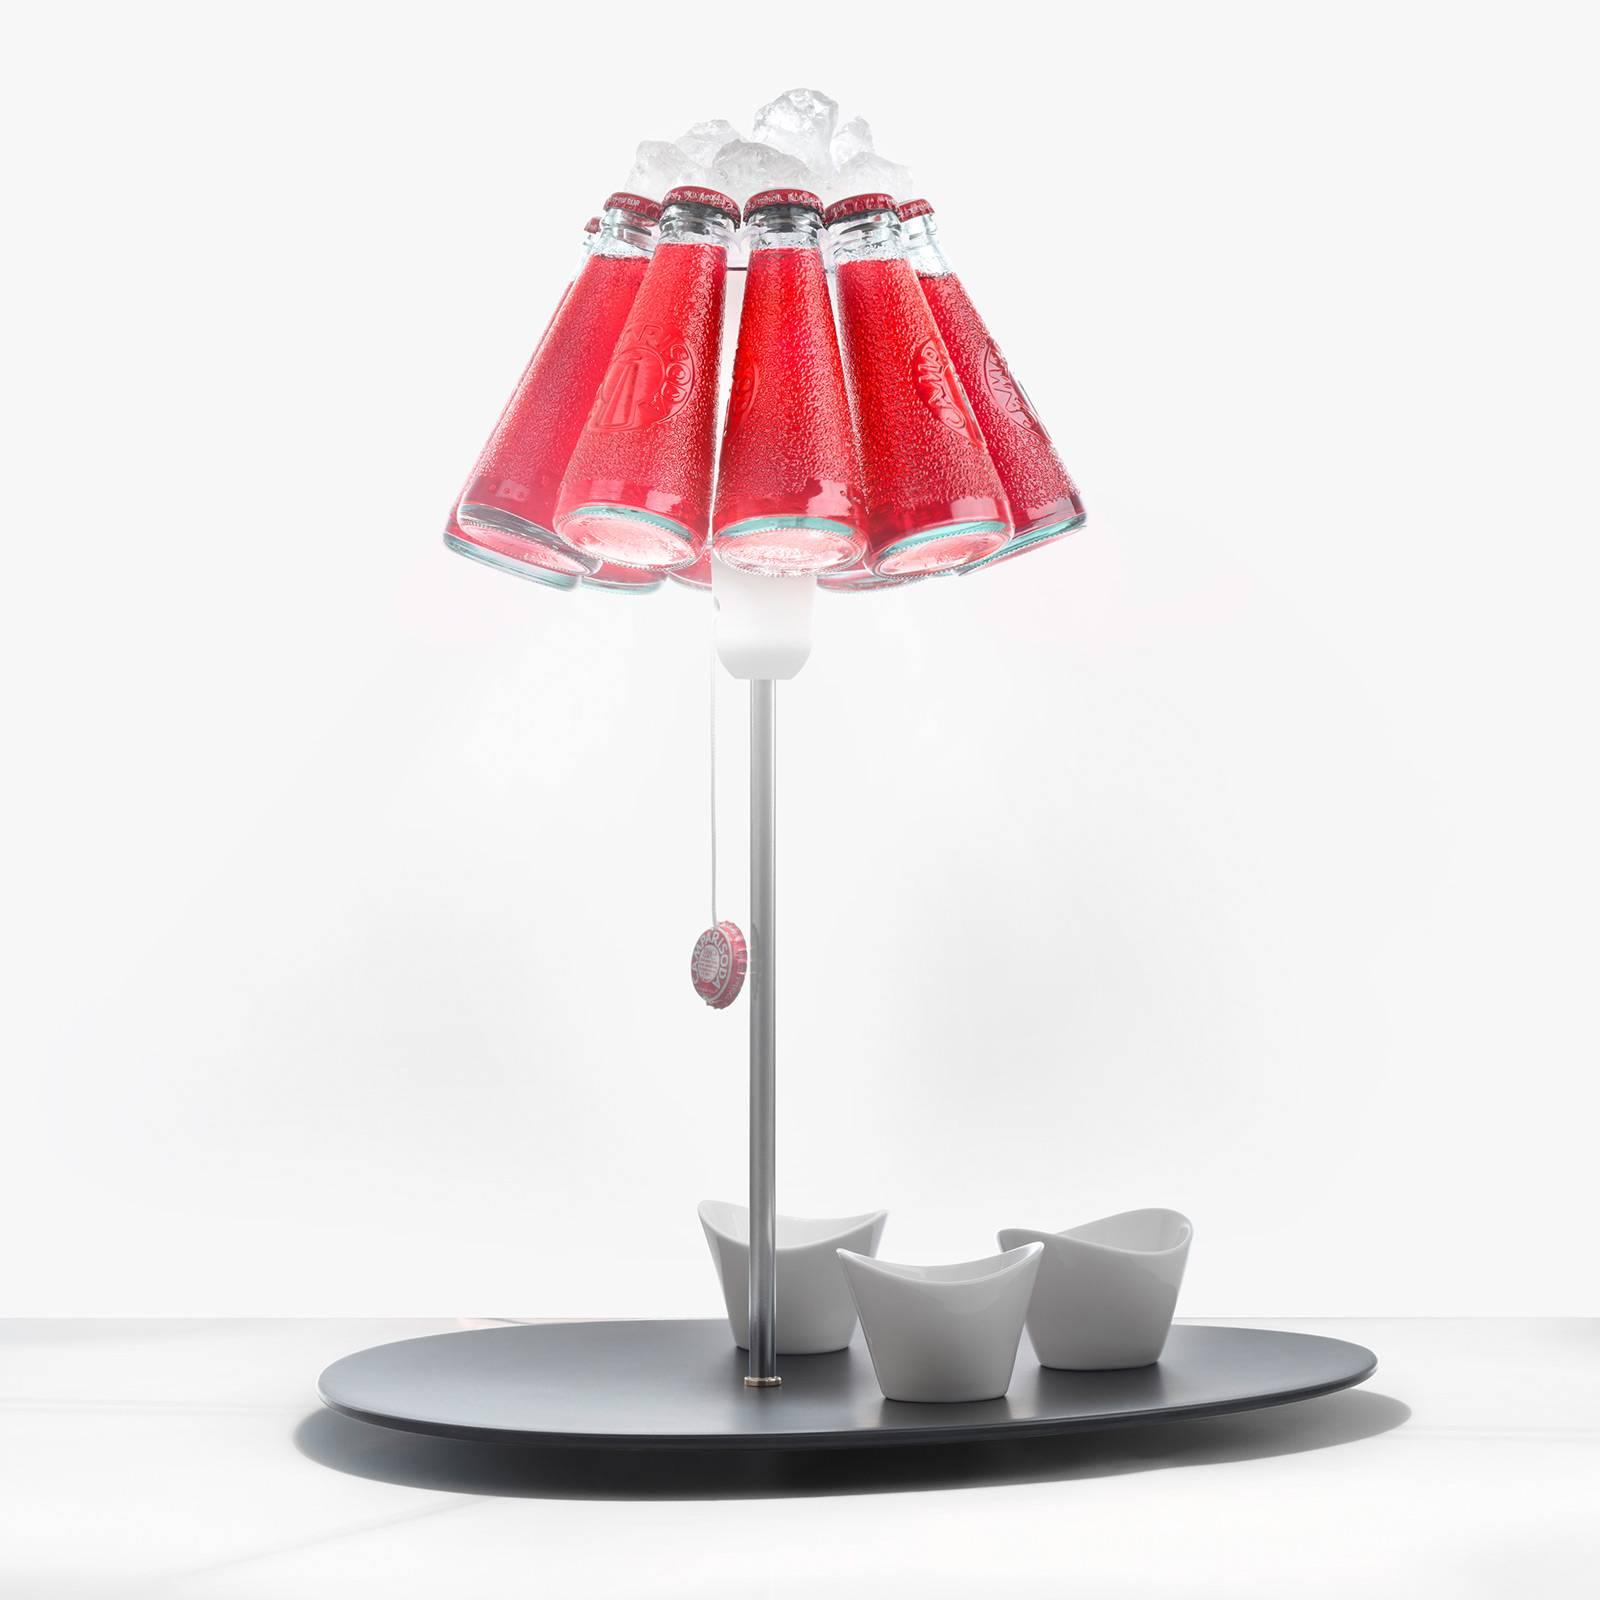 Ingo Maurer Campari Bar -pöytälamppu pulloista